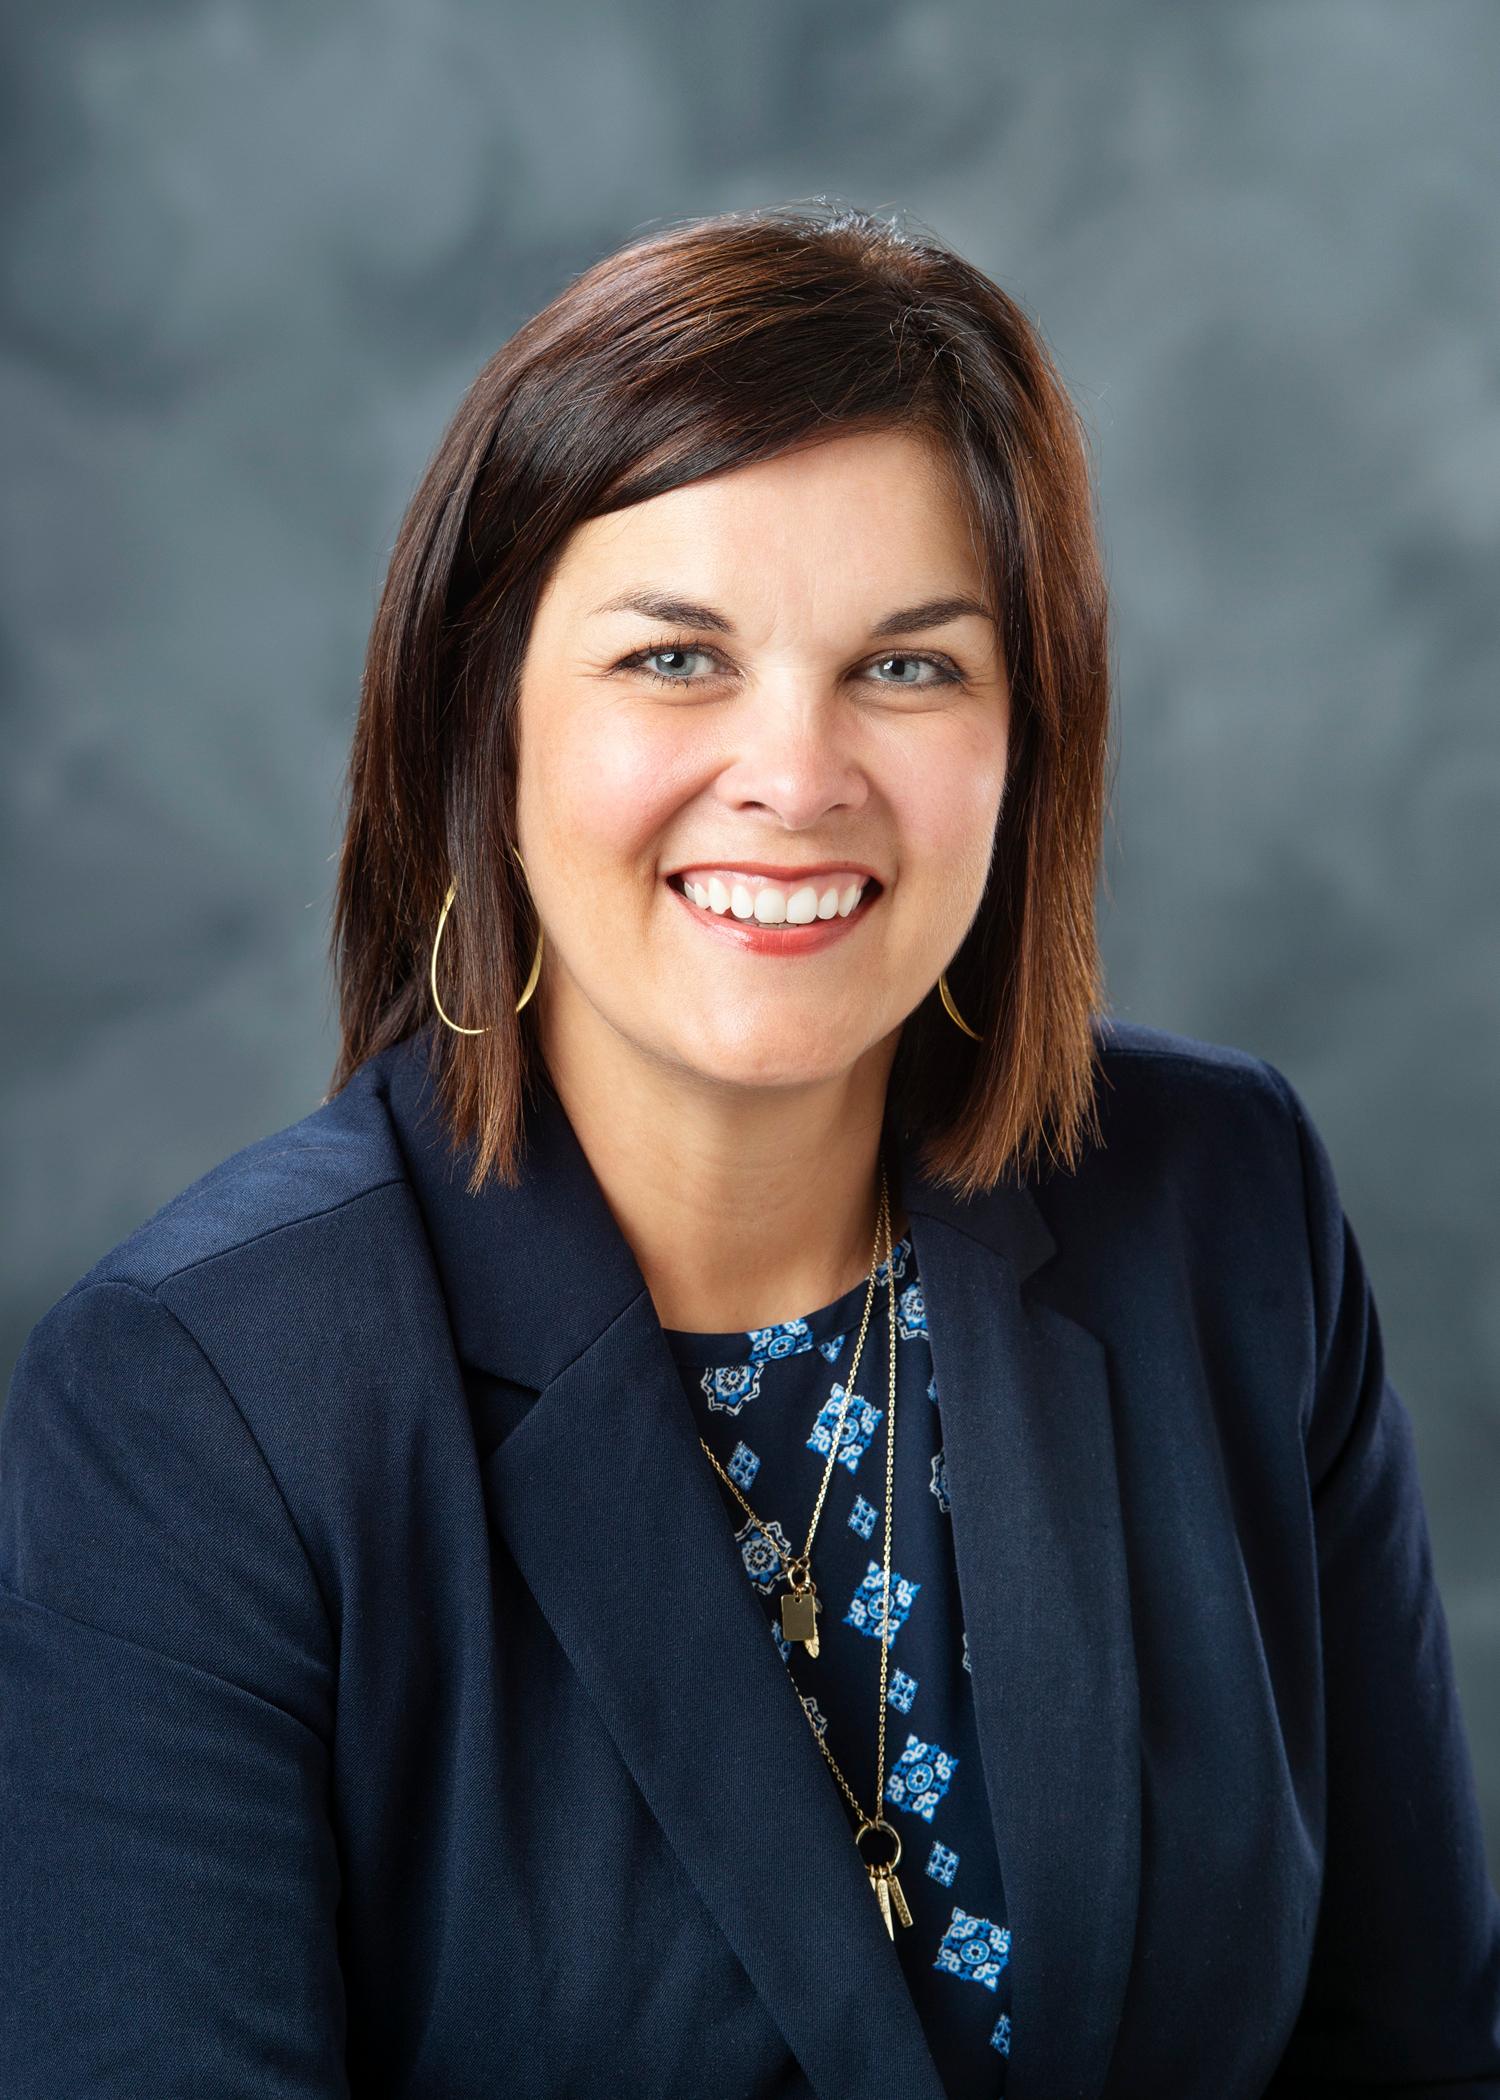 Laura Walton PhD, APR